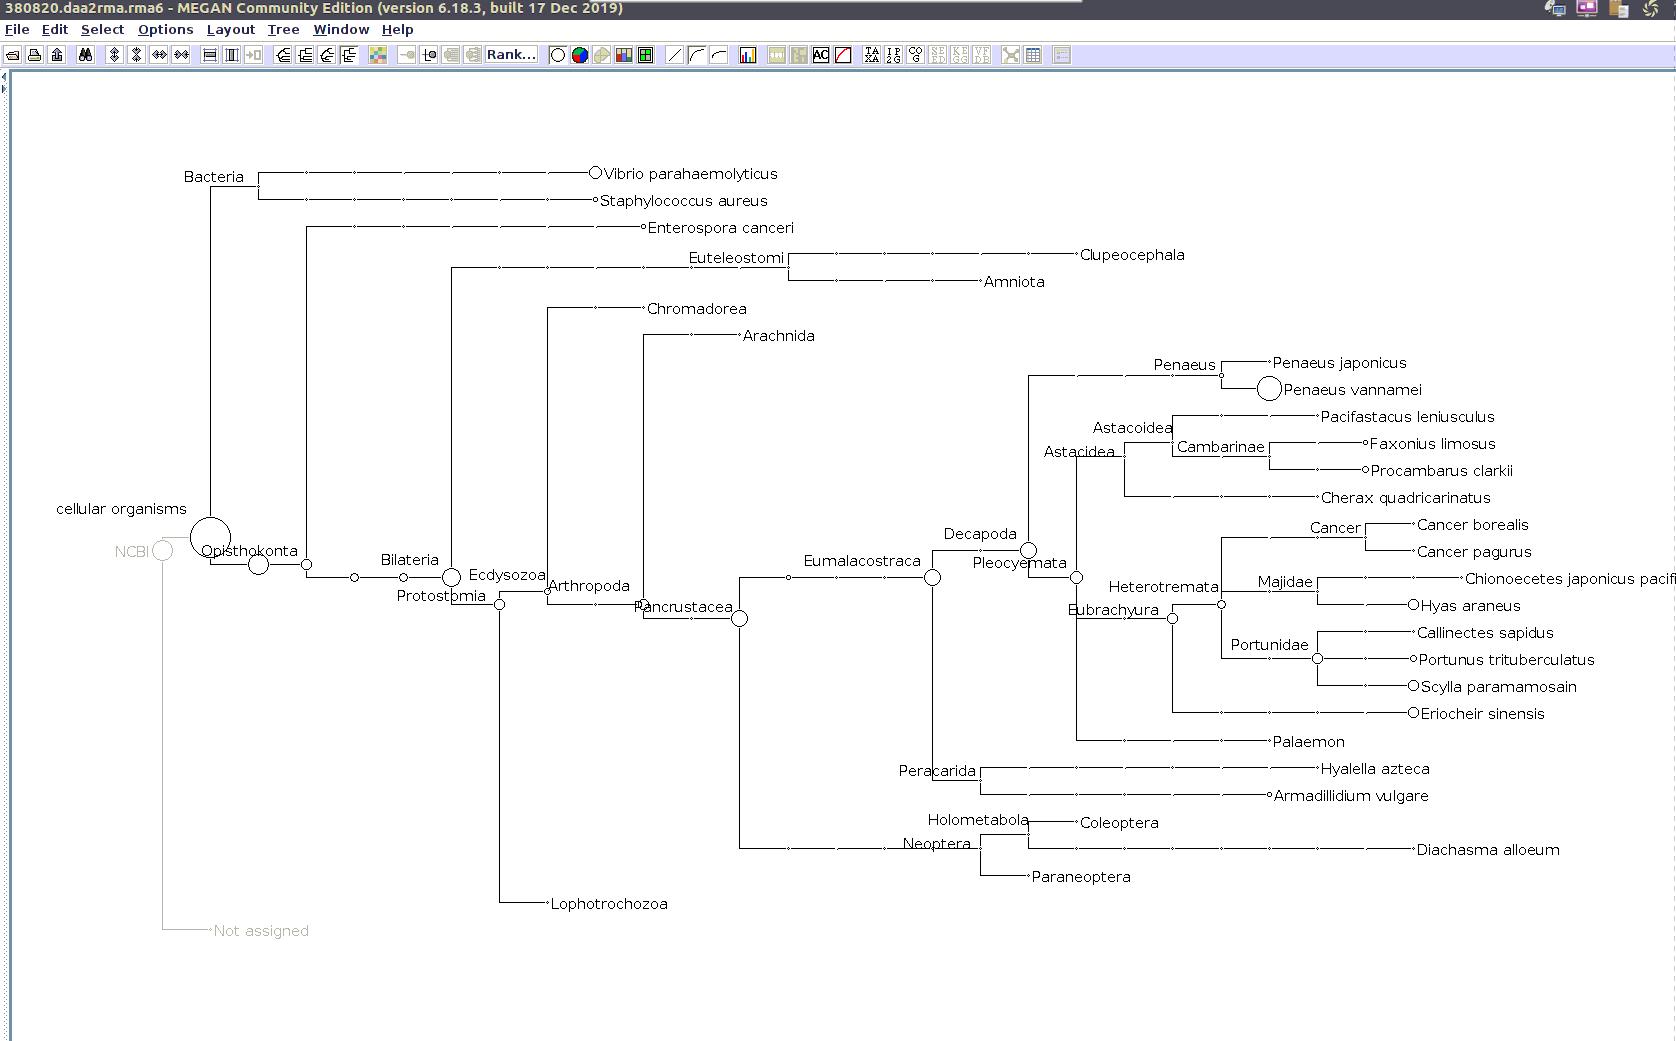 (MEGAN taxonomic tree for 380820